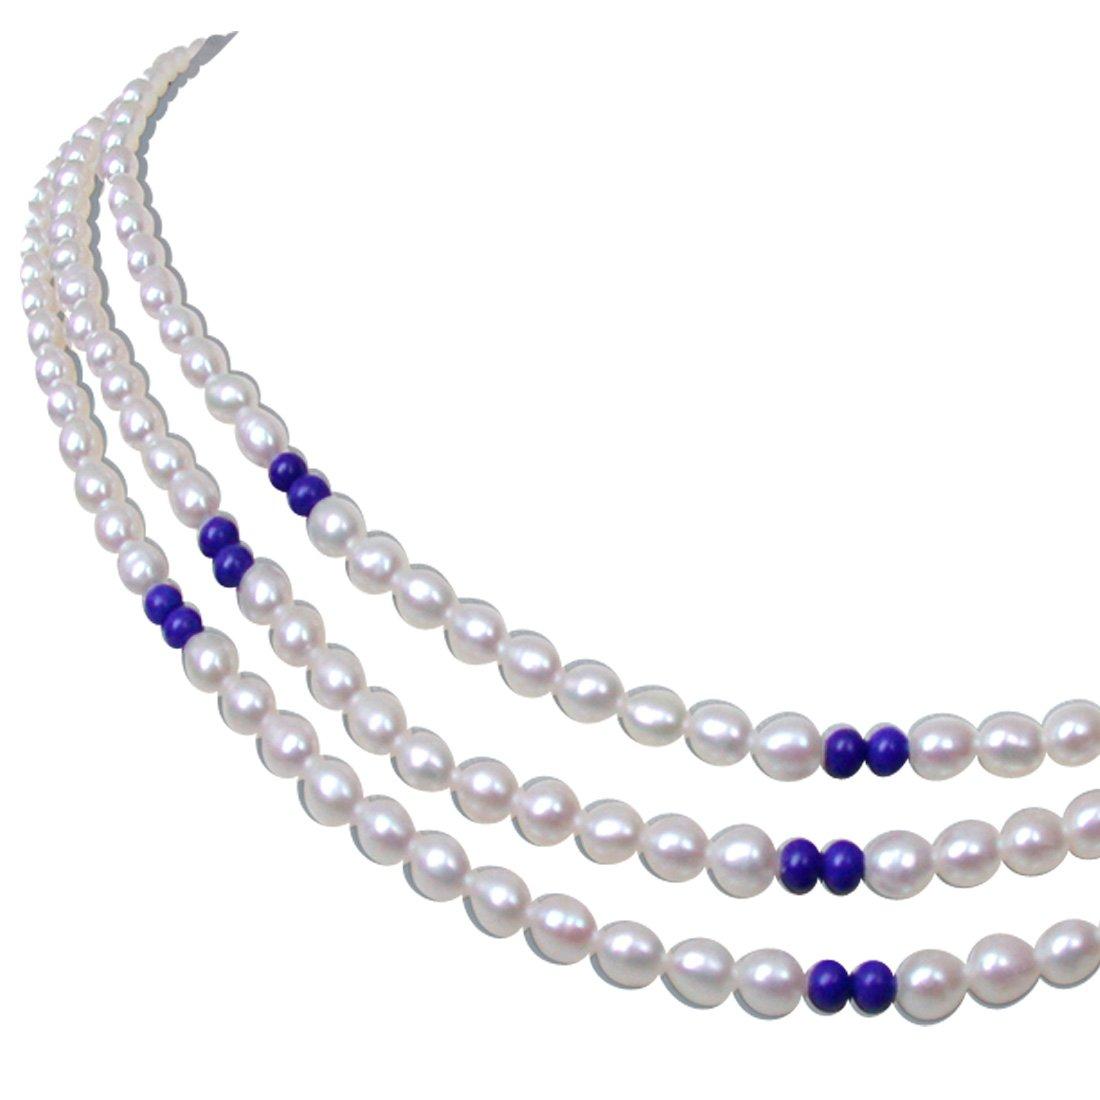 Blue Lapiz Love - 2 Line Real Rice Pearl & Blue Lapiz Beads Necklace for Women (SN121)